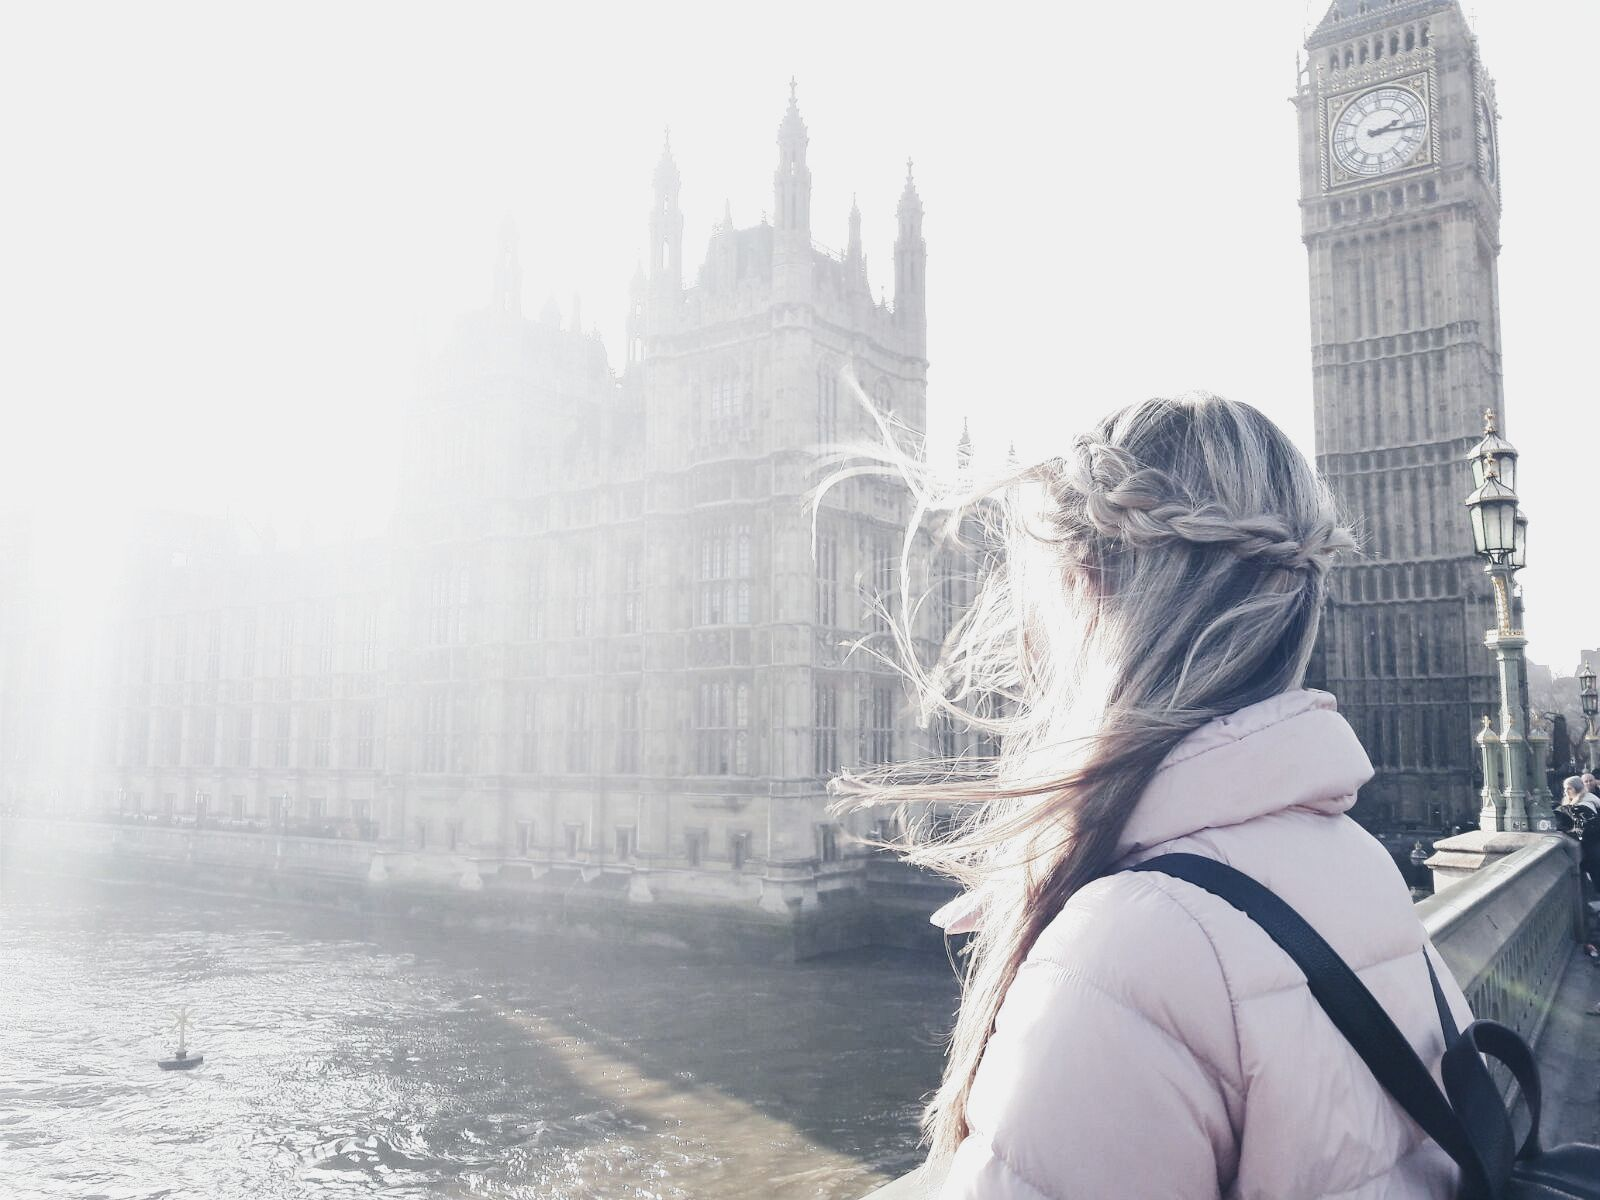 Travel braided hairstyle IG: kristynan #travel #london #travelhairstyle #braid #easyhairstyle